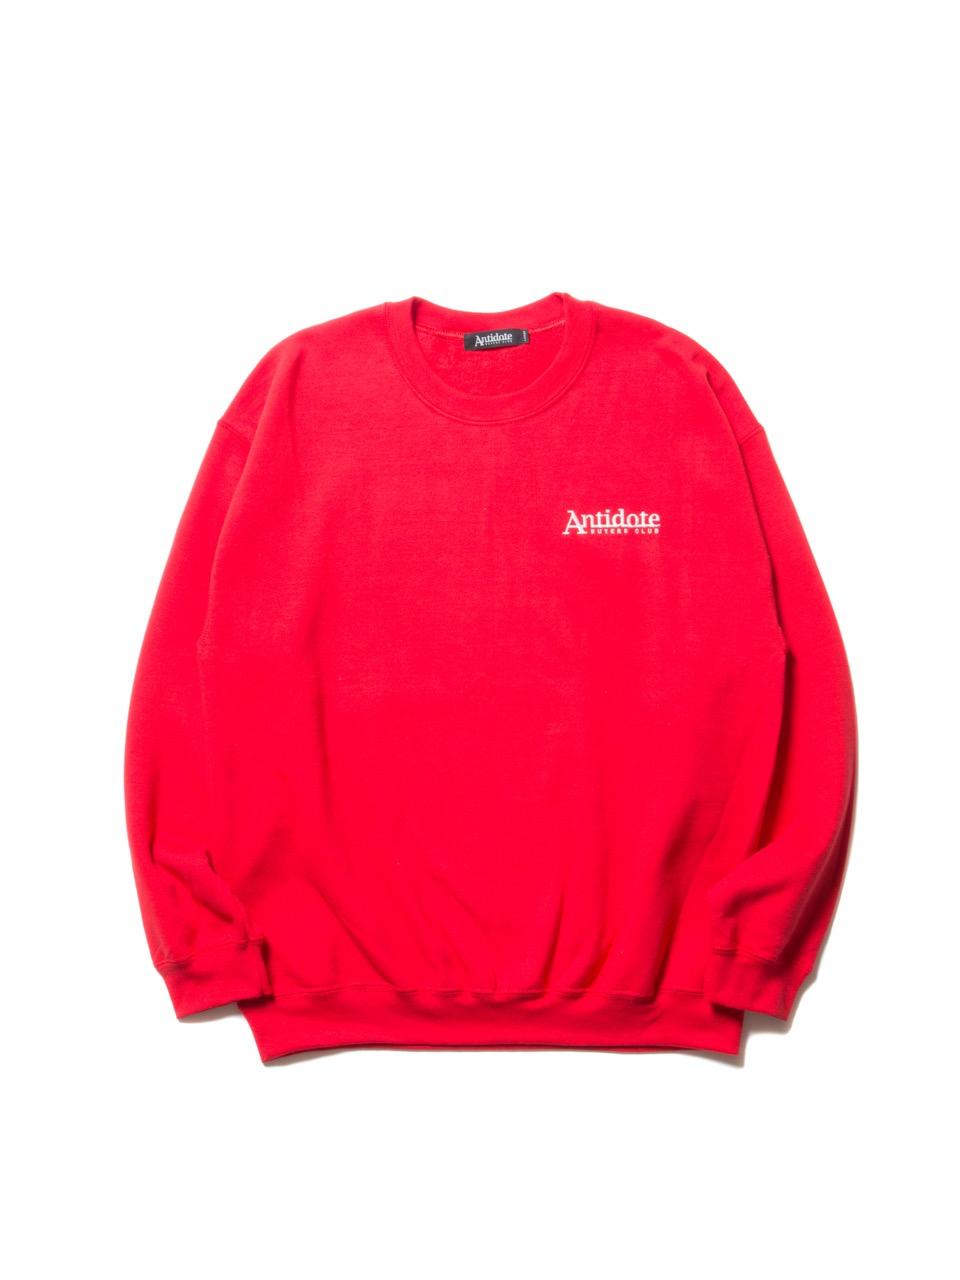 ANTIDOTE BUYERS CLUB Crewneck L/S Sweatshirt DETOXIFY